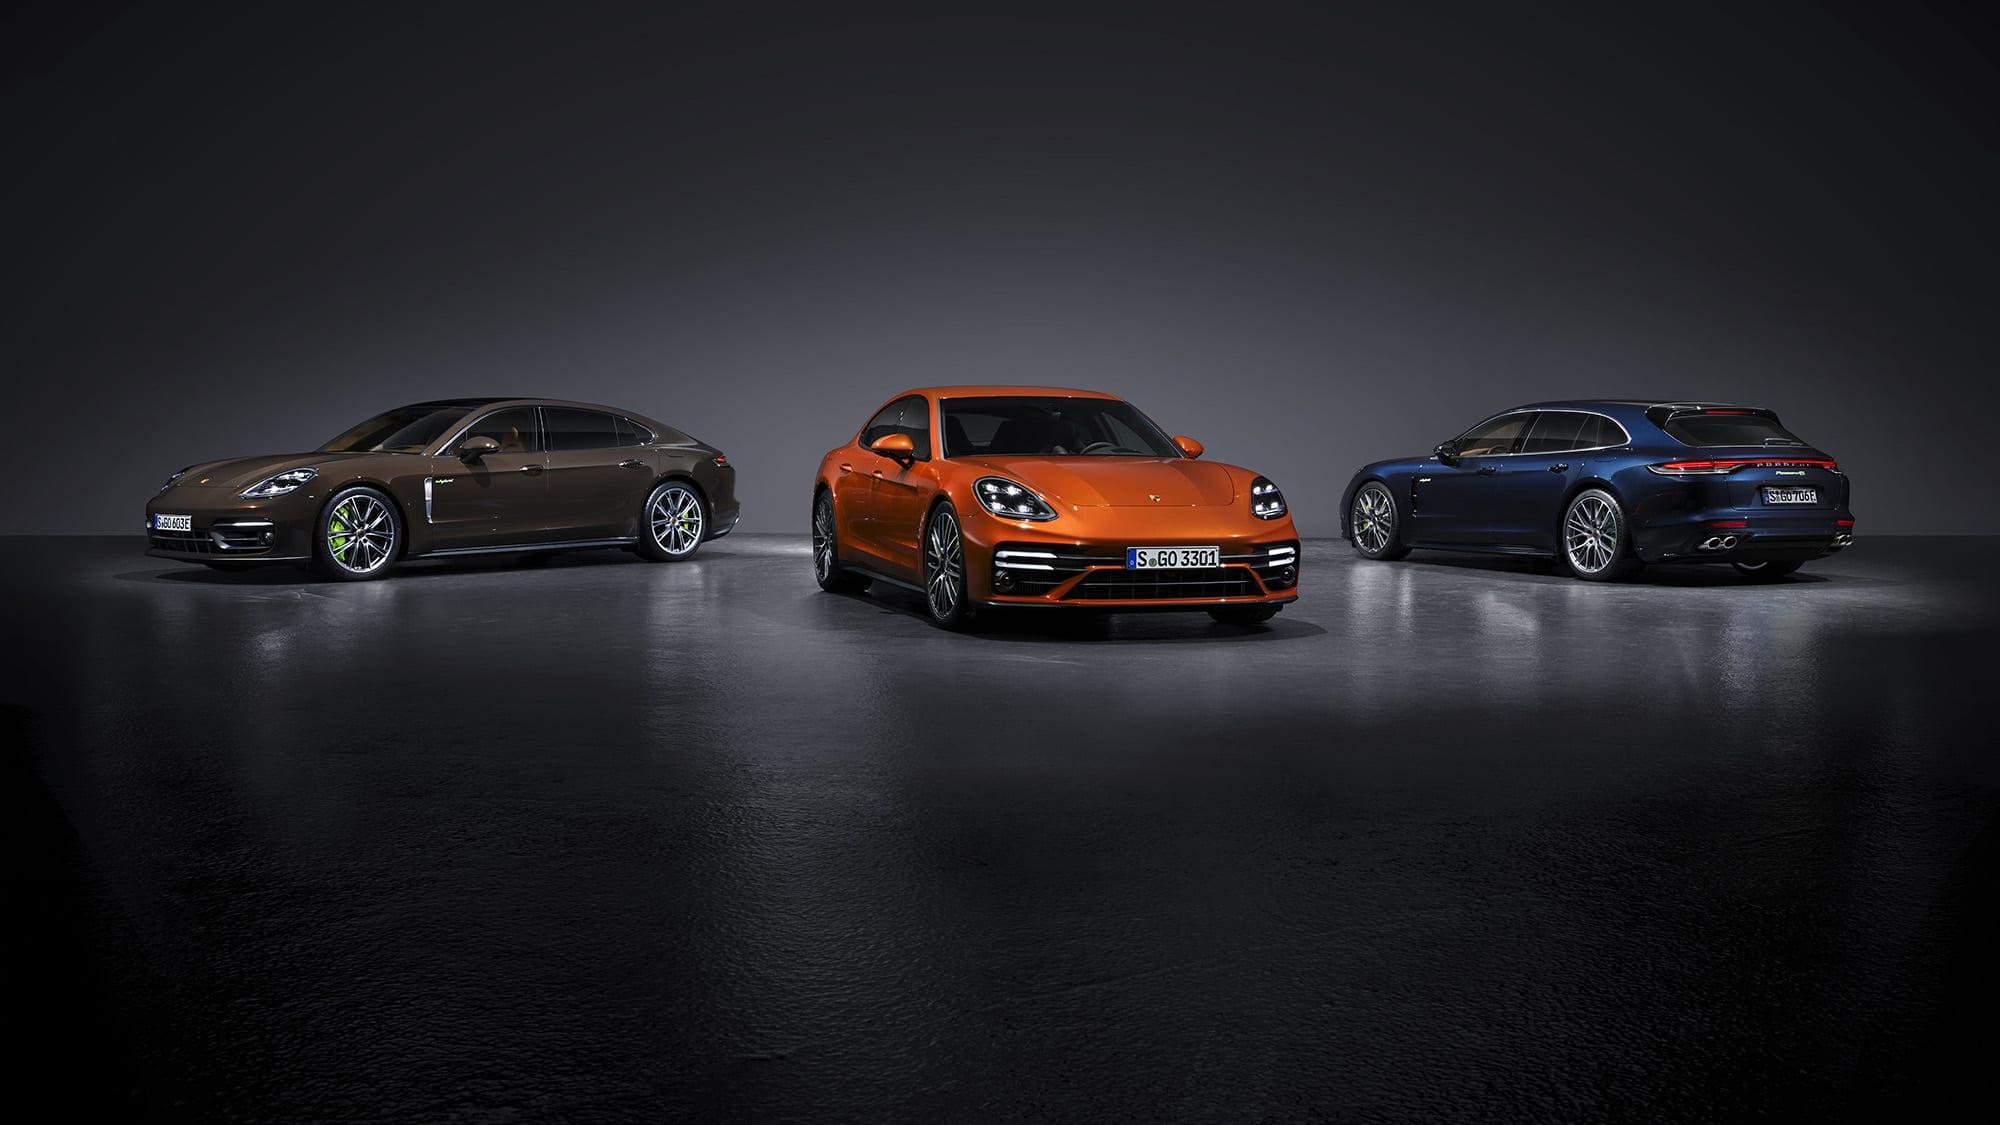 2021 Porsche Panamera revealed: More power, less money